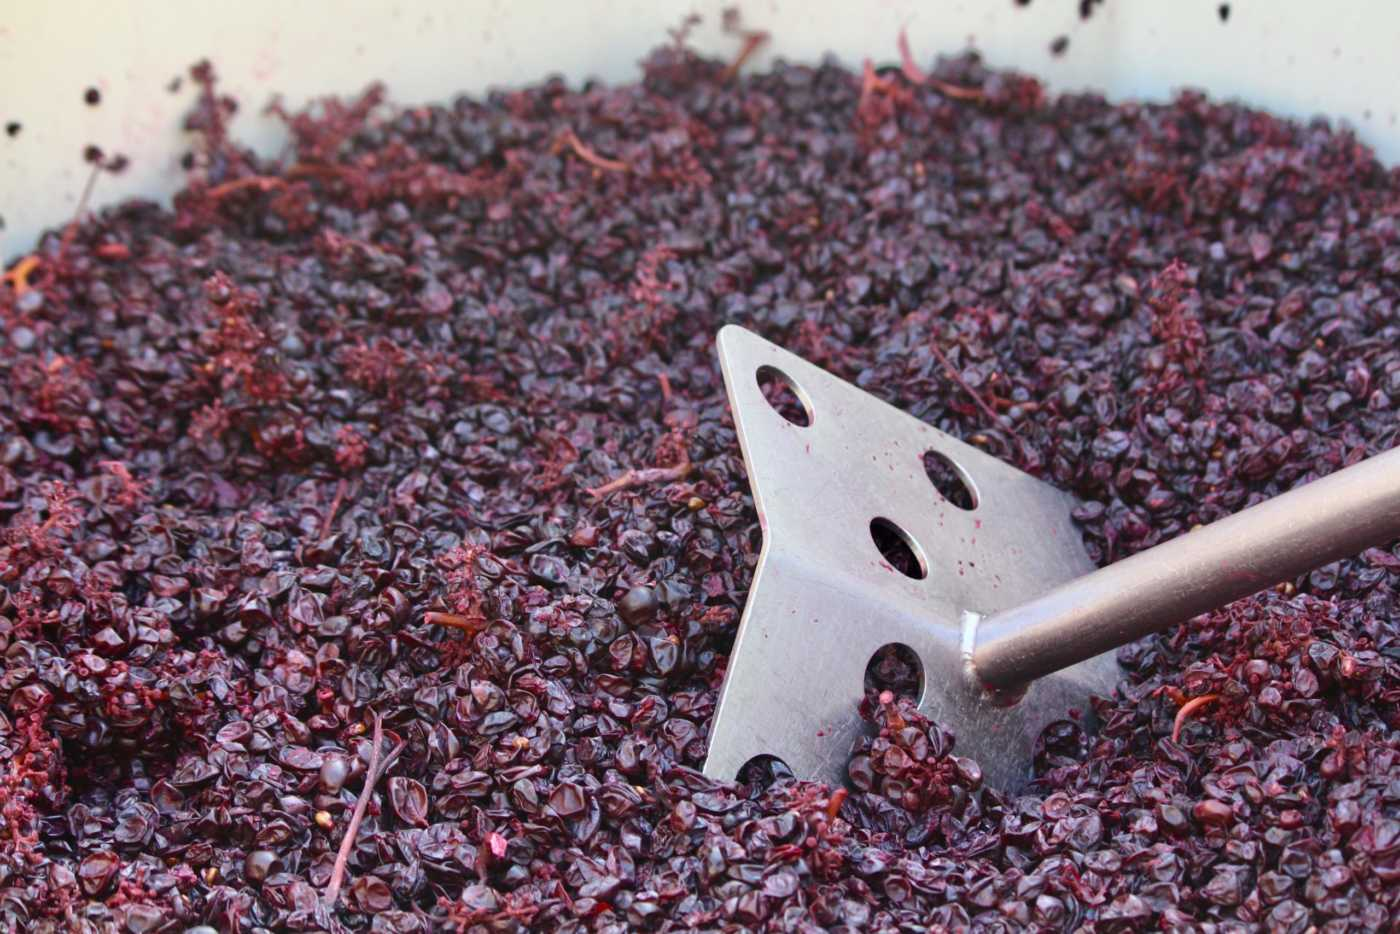 pushing down crushed grapes